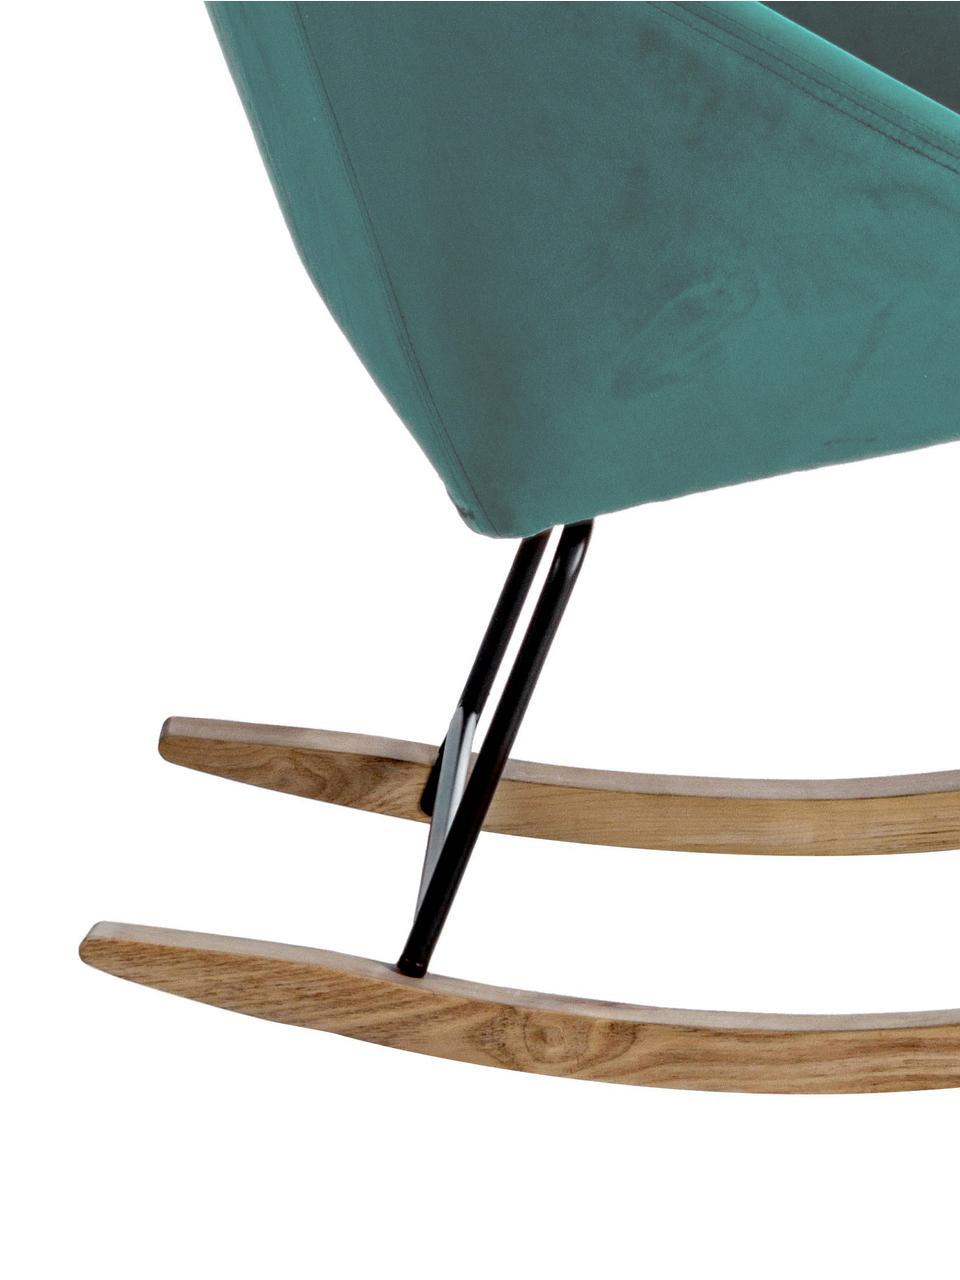 Samt-Schaukelstuhl Annika in Grün, Bezug: Polyestersamt 70.000 Sche, Gestell: Metall, pulverbeschichtet, Korpus: Sperrholz, Metall, Samt Pfauenblau, B 74 x T 87 cm